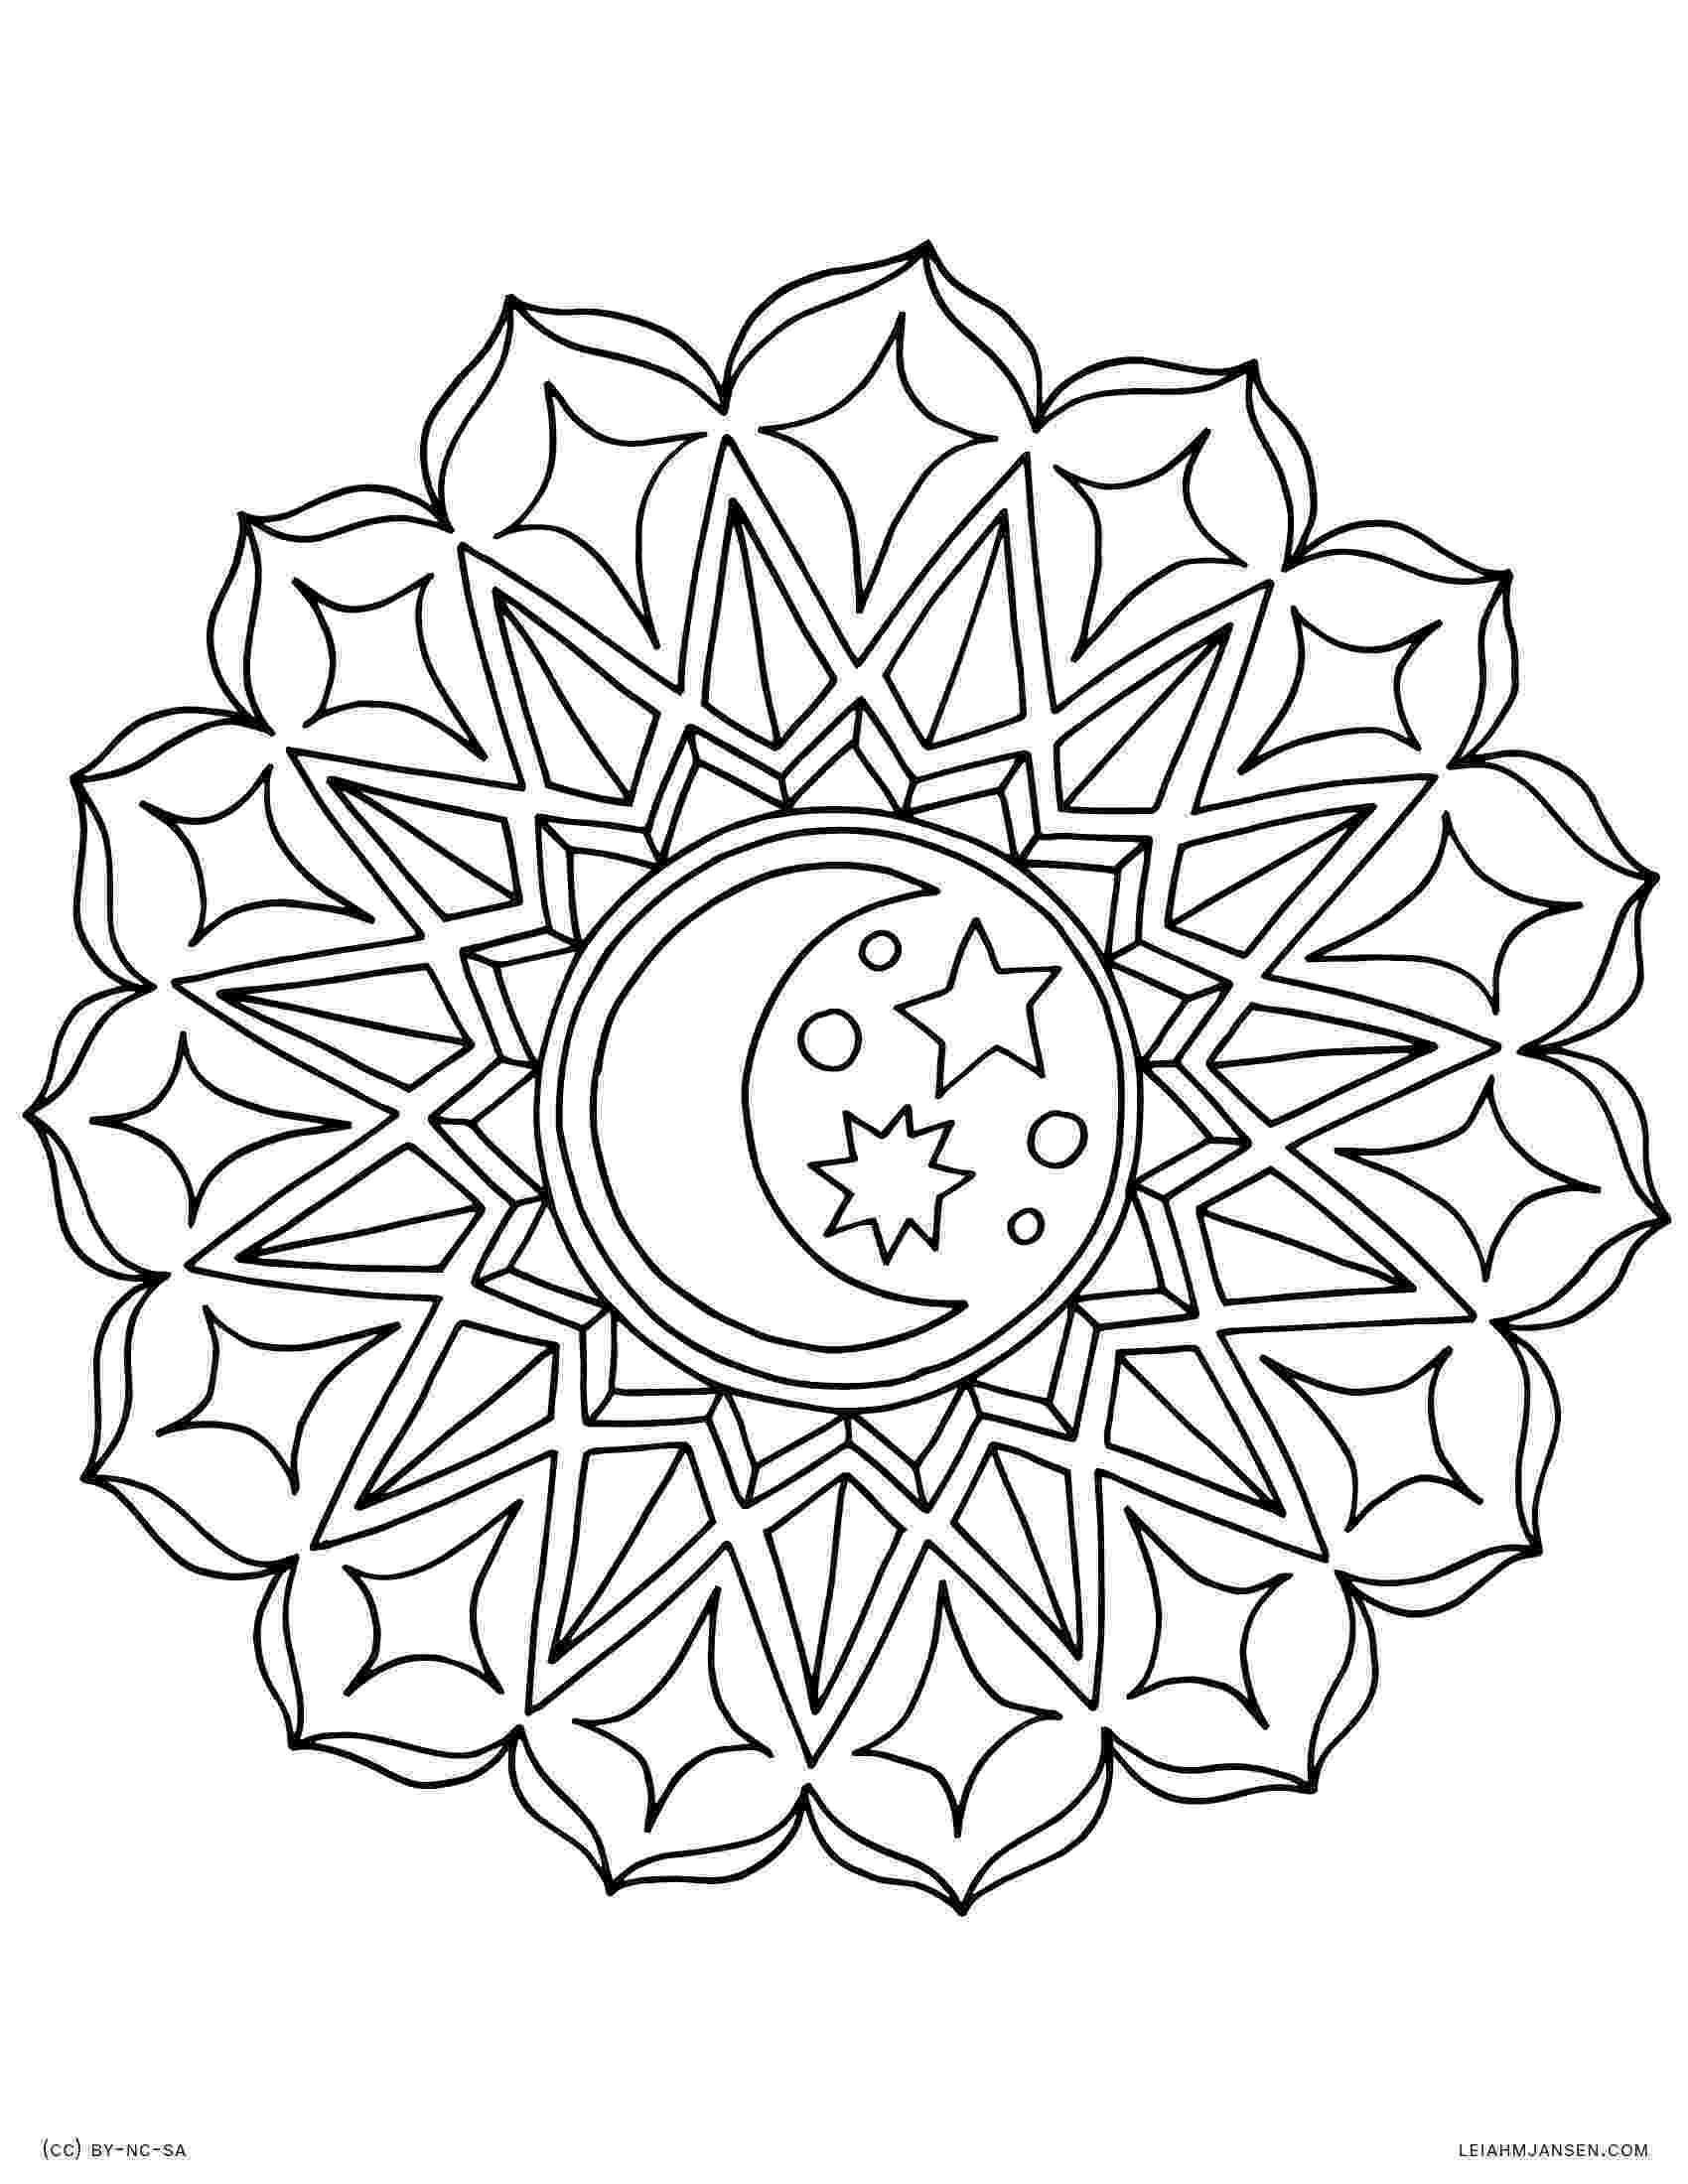 free printable mandala coloring sheets coloring pages mandala sheets free coloring printable